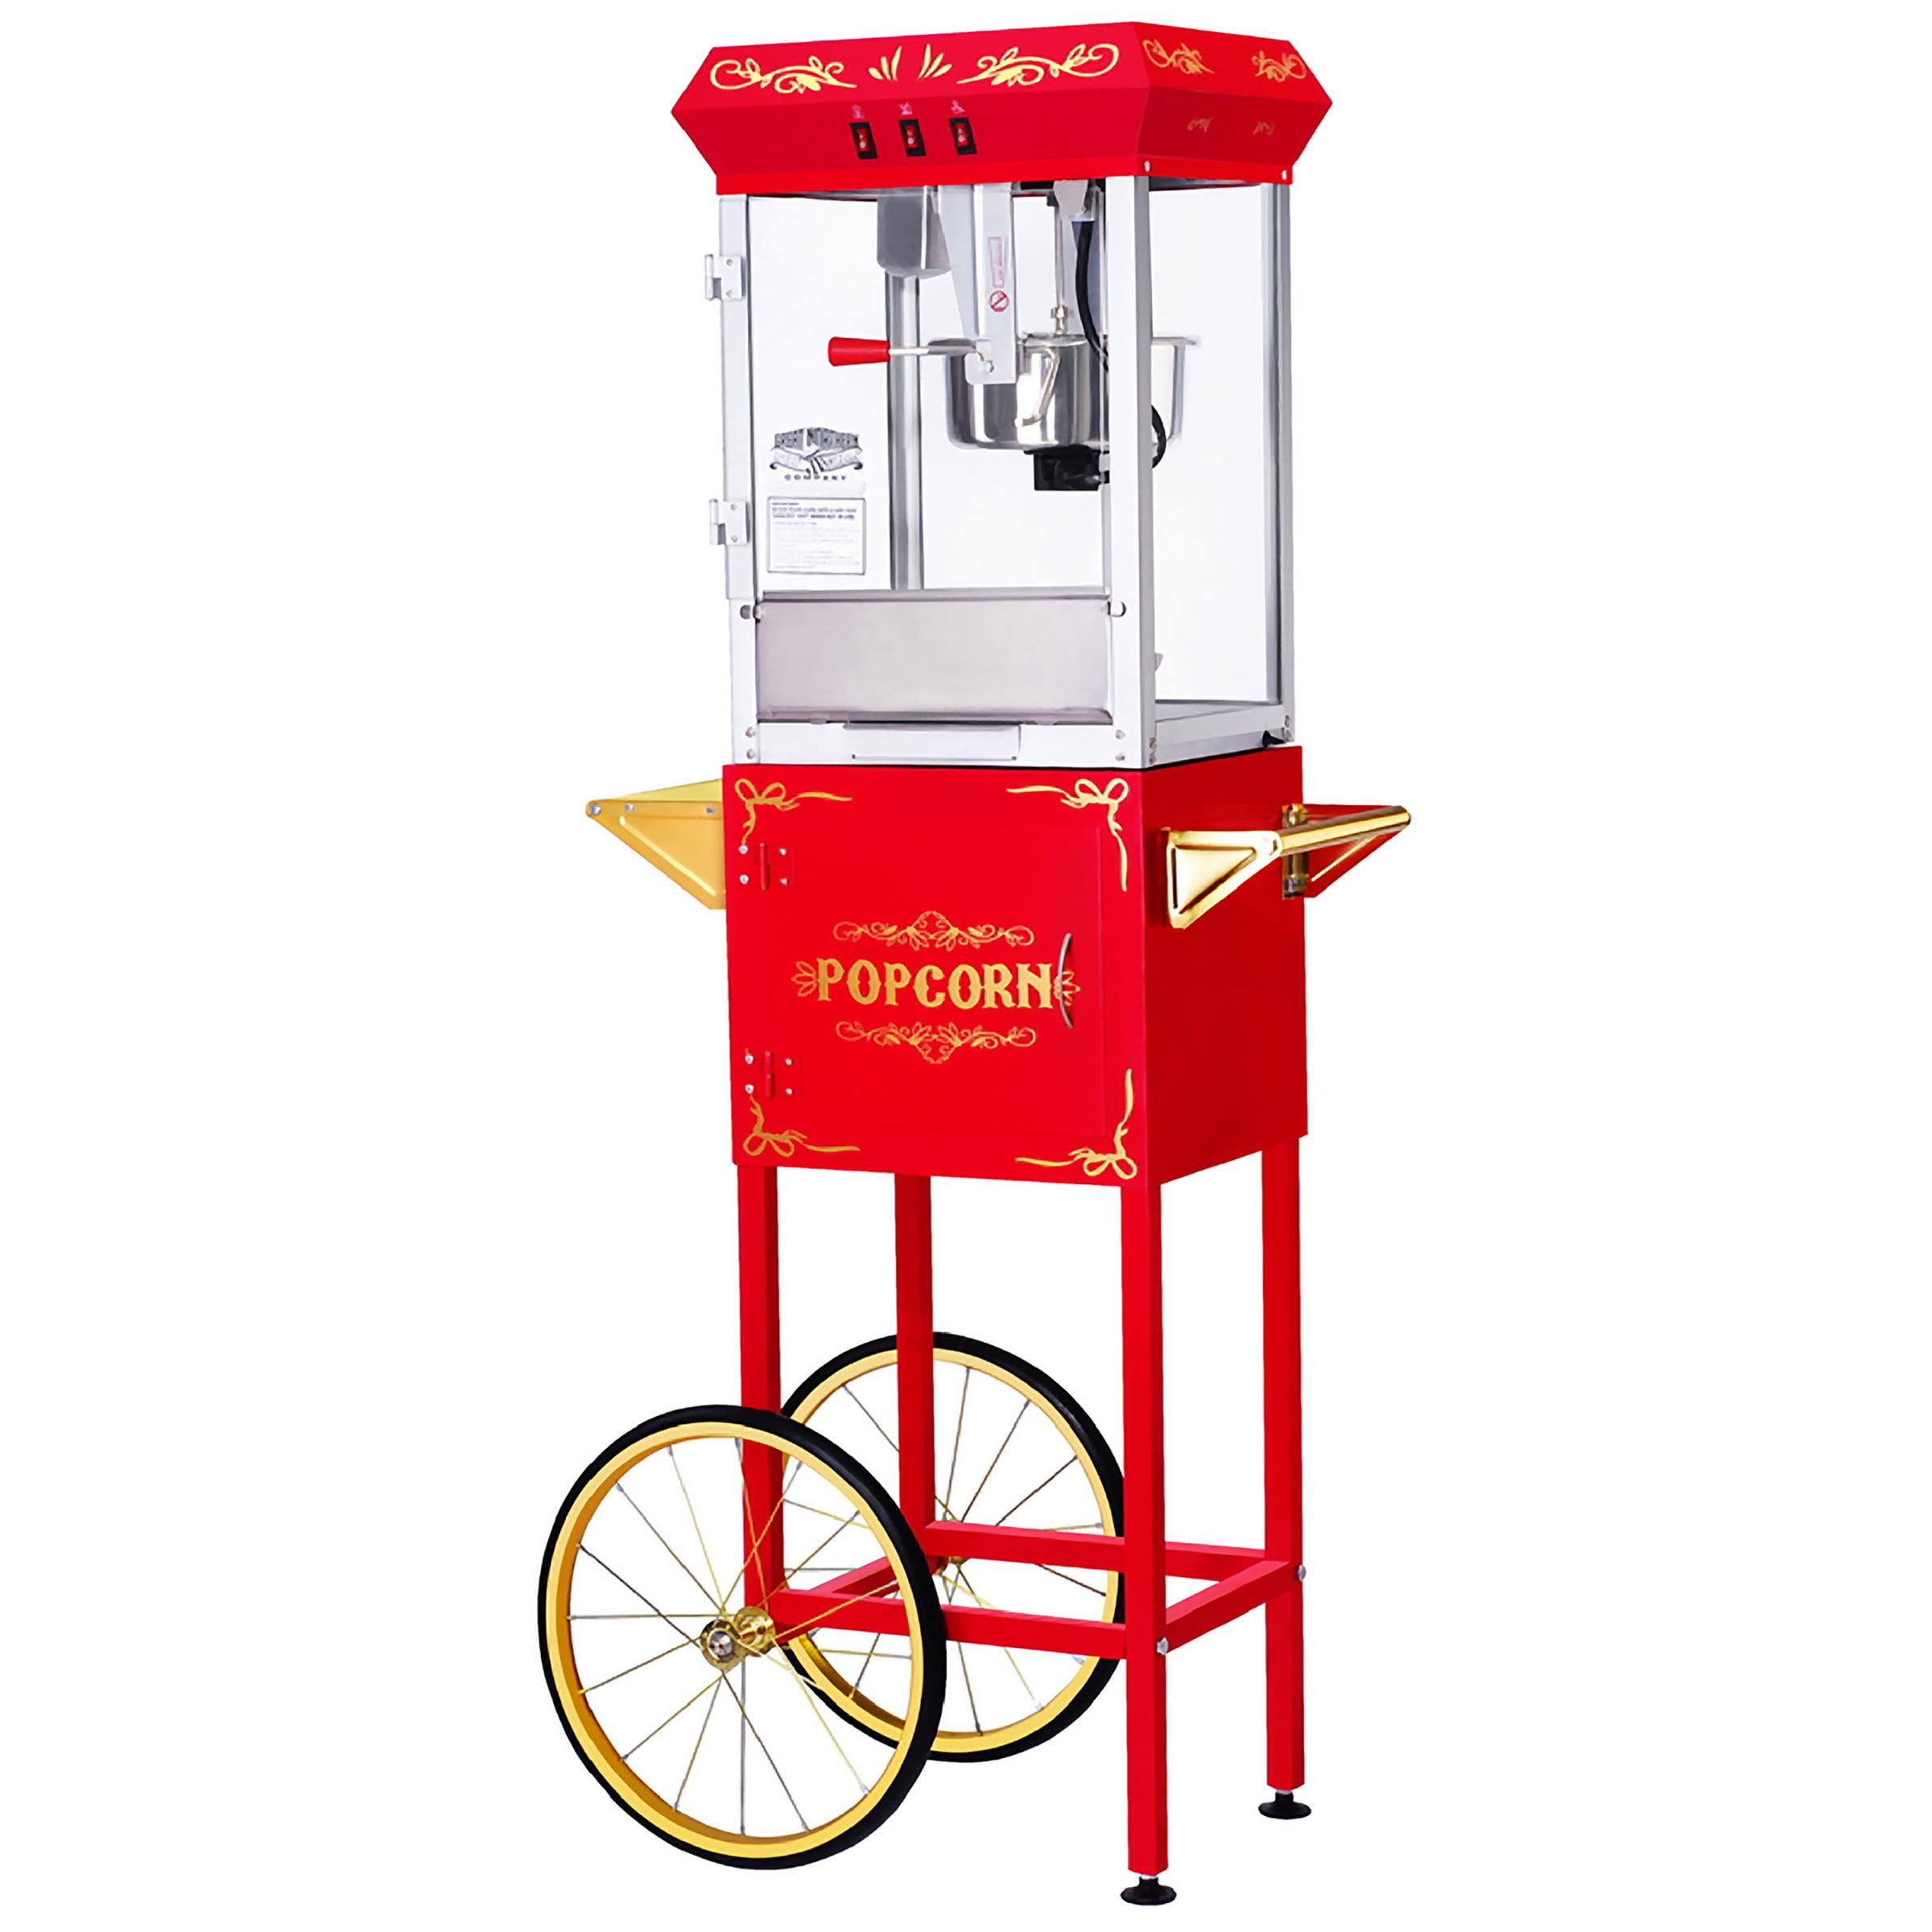 All-Star Popcorn Popper Machine & Cart, 8oz by Great Northern Popcorn by Trademark Global LLC